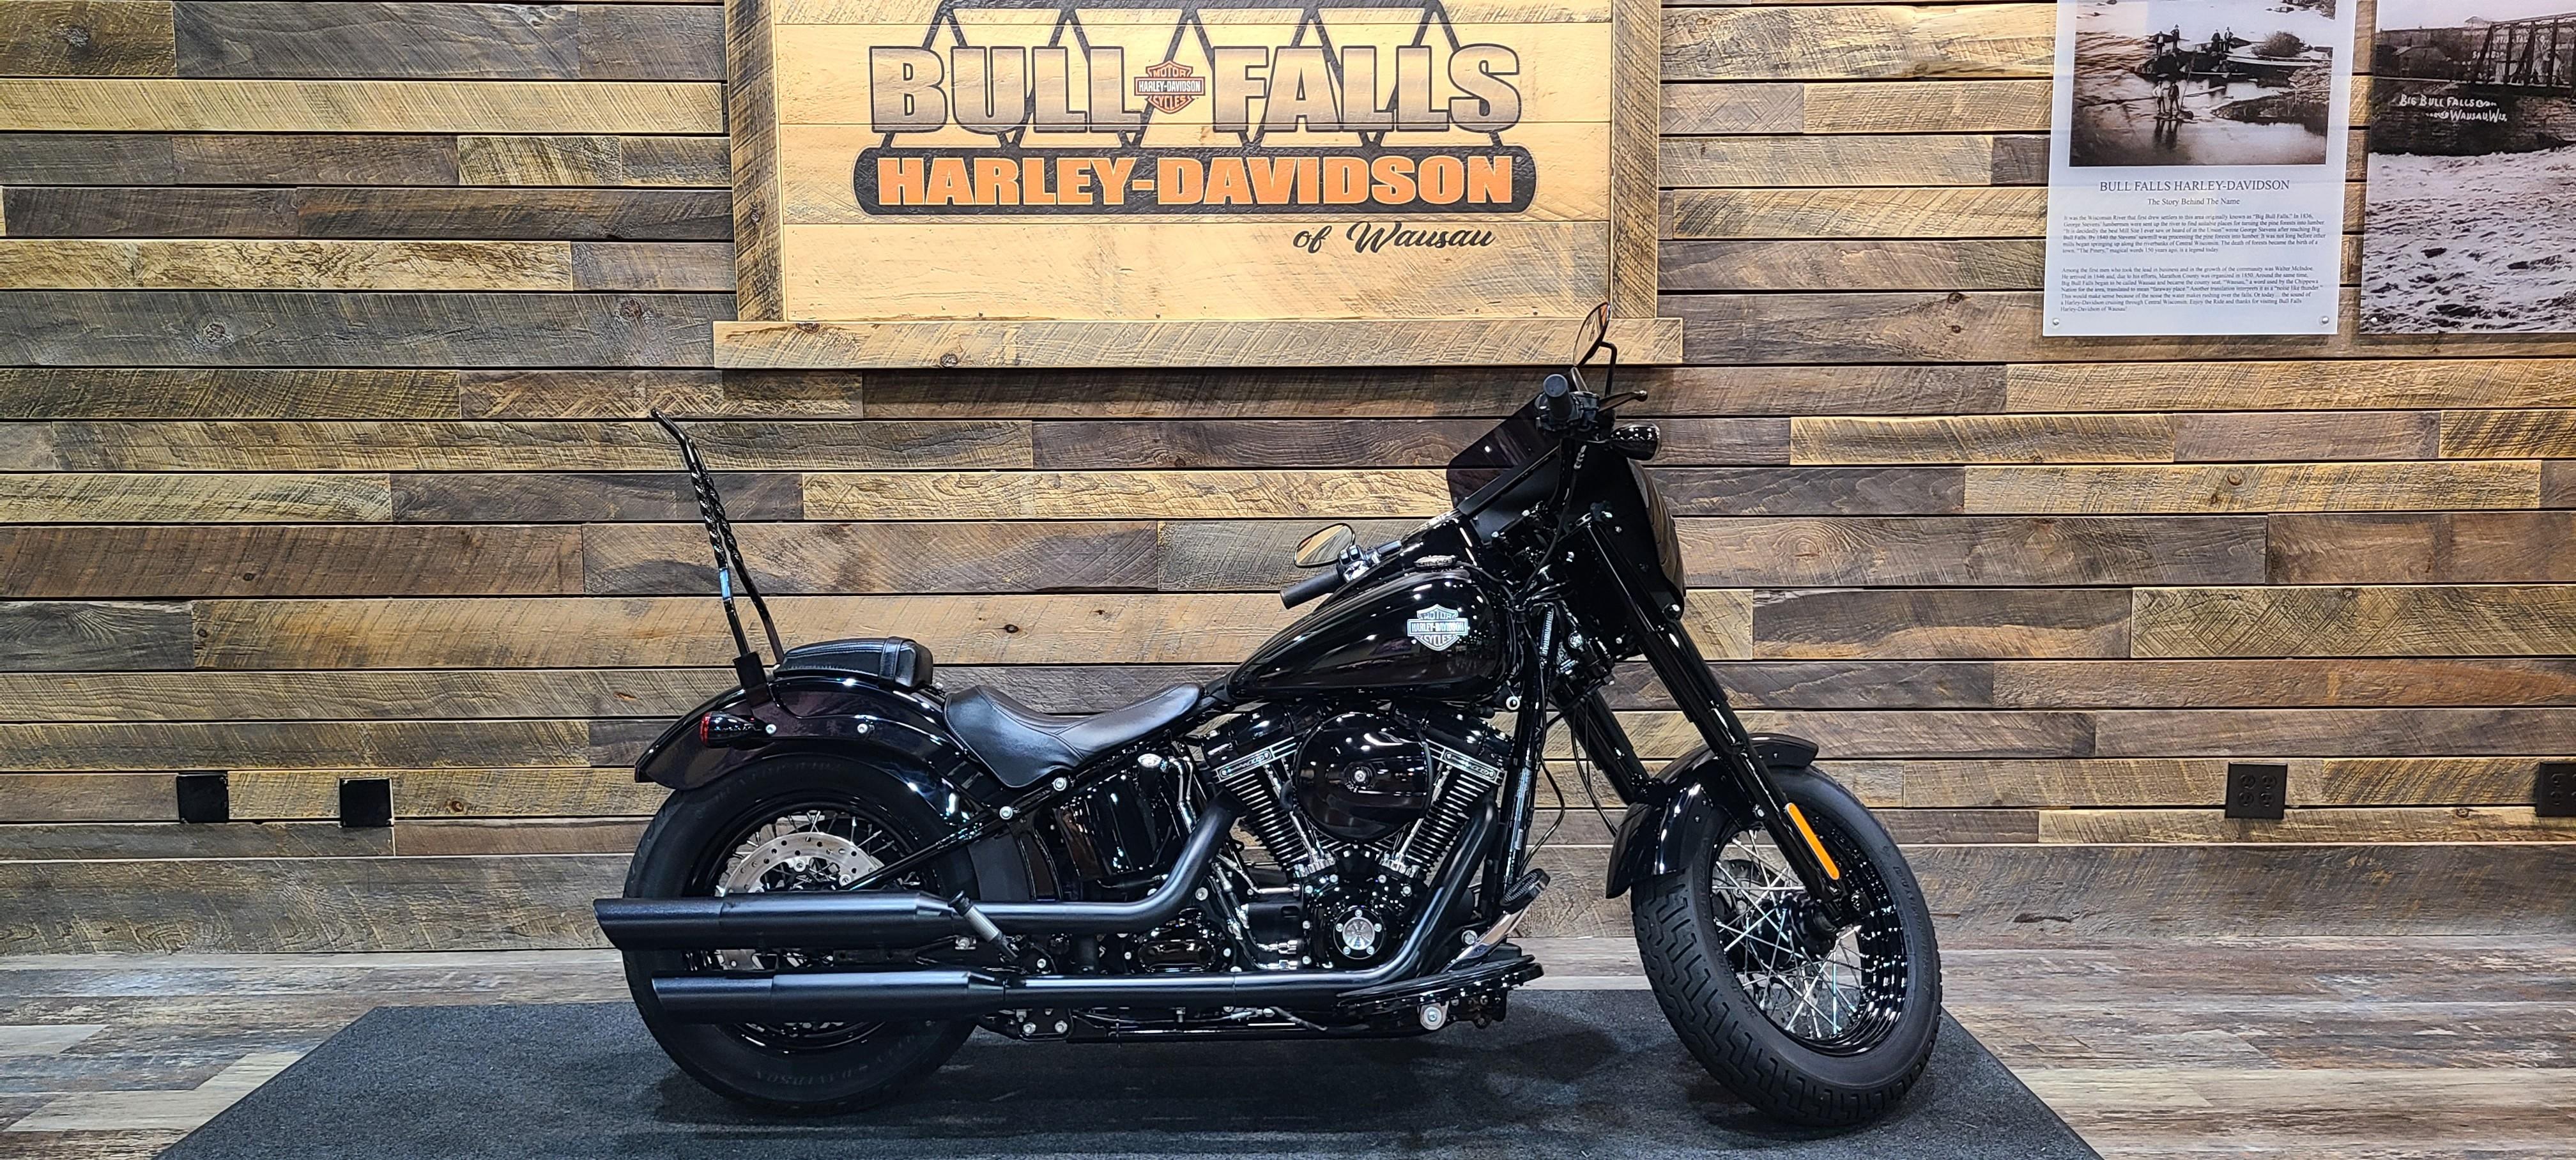 2017 Harley-Davidson S-Series Slim at Bull Falls Harley-Davidson